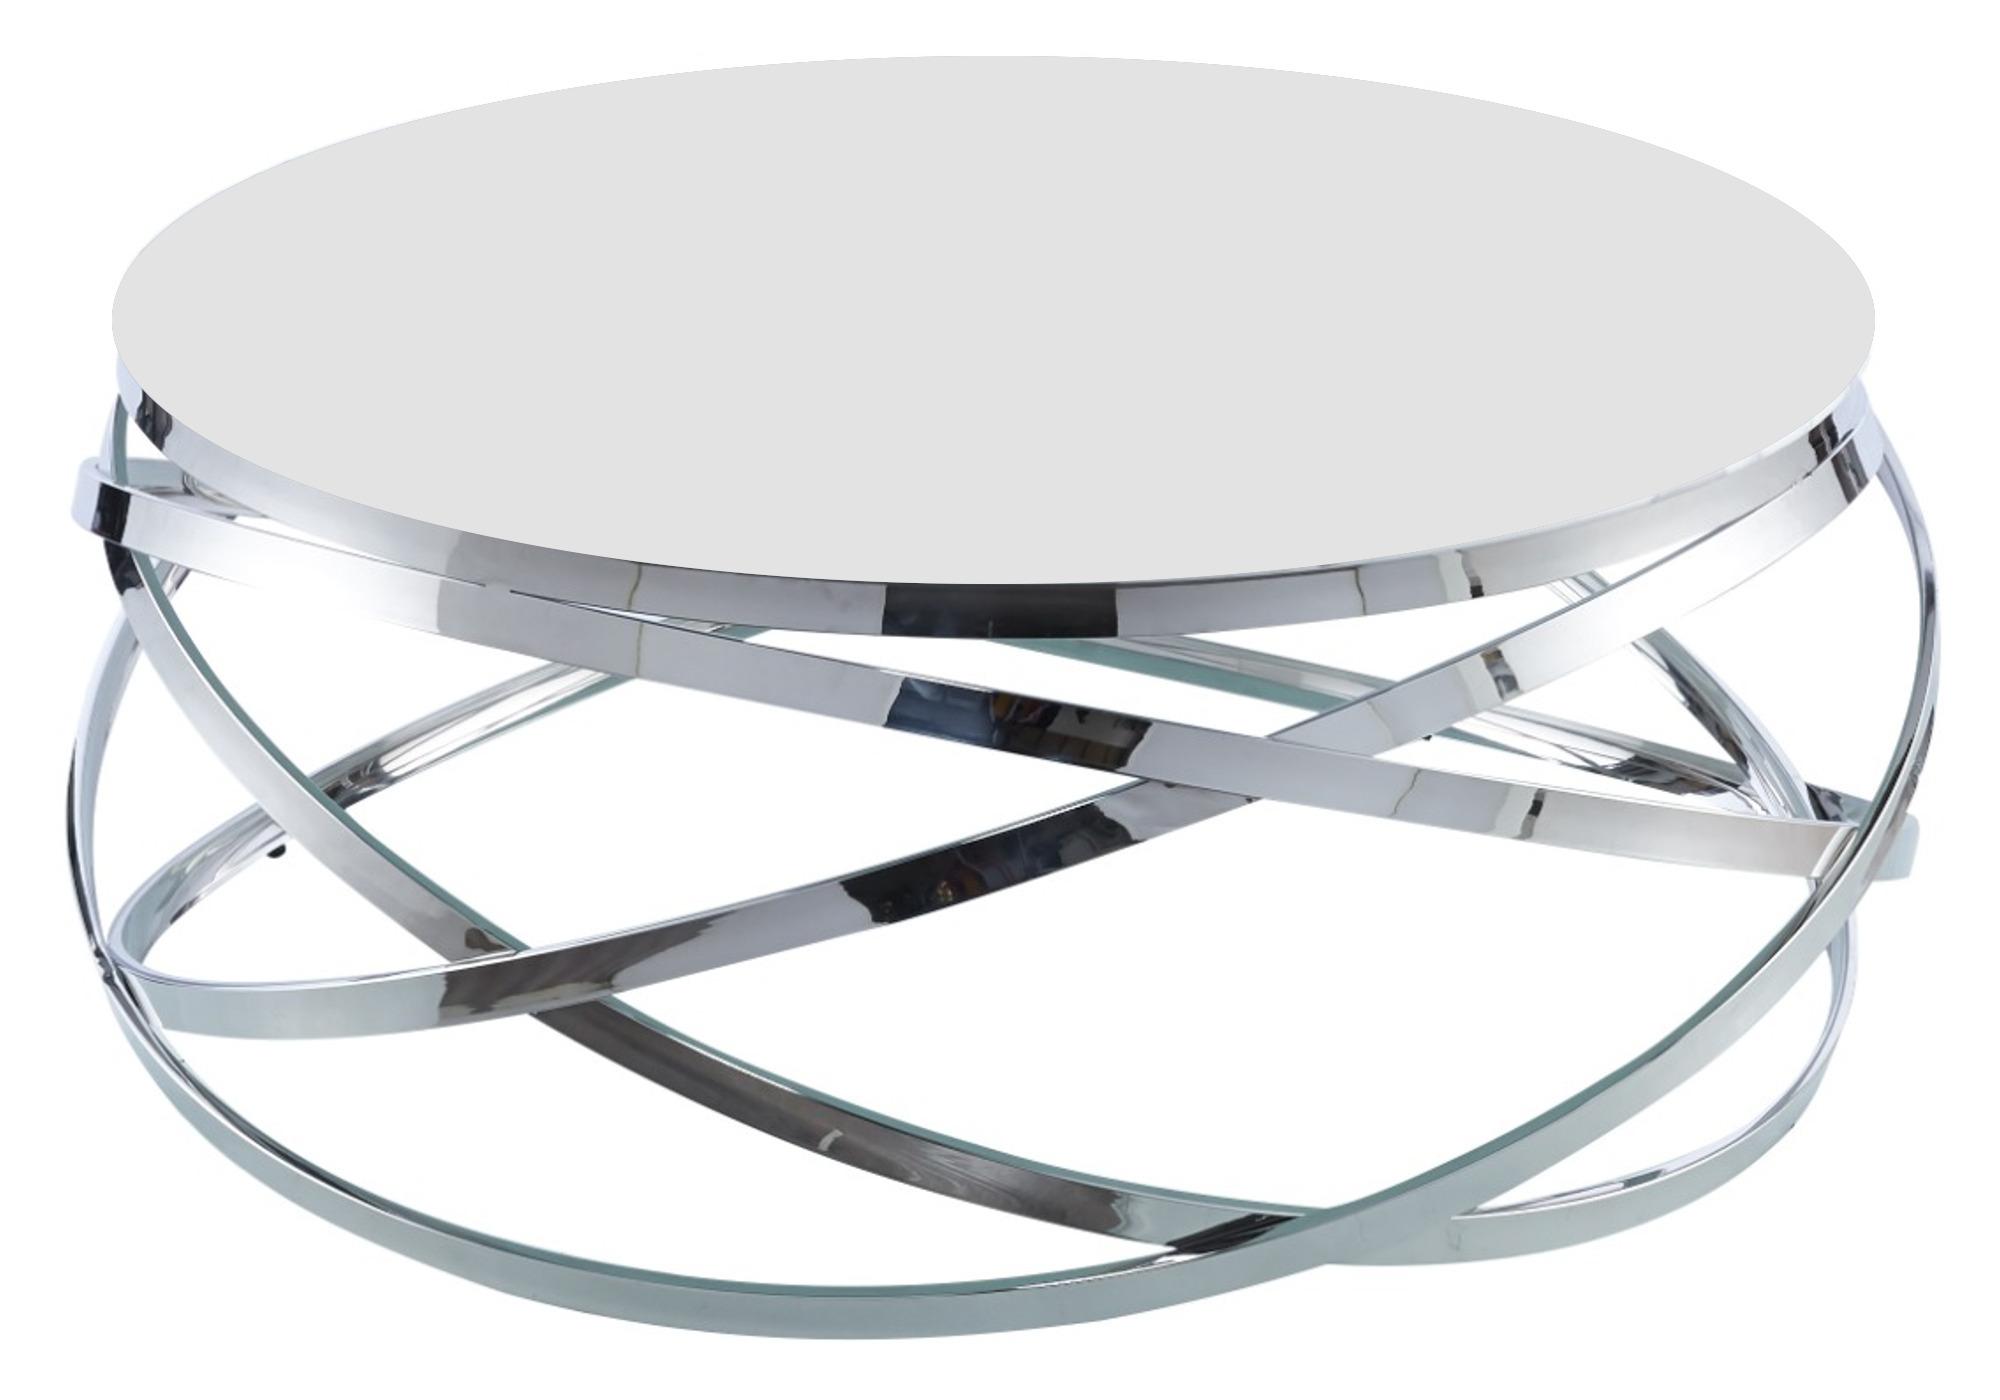 Table basse design chromé blanc EVO